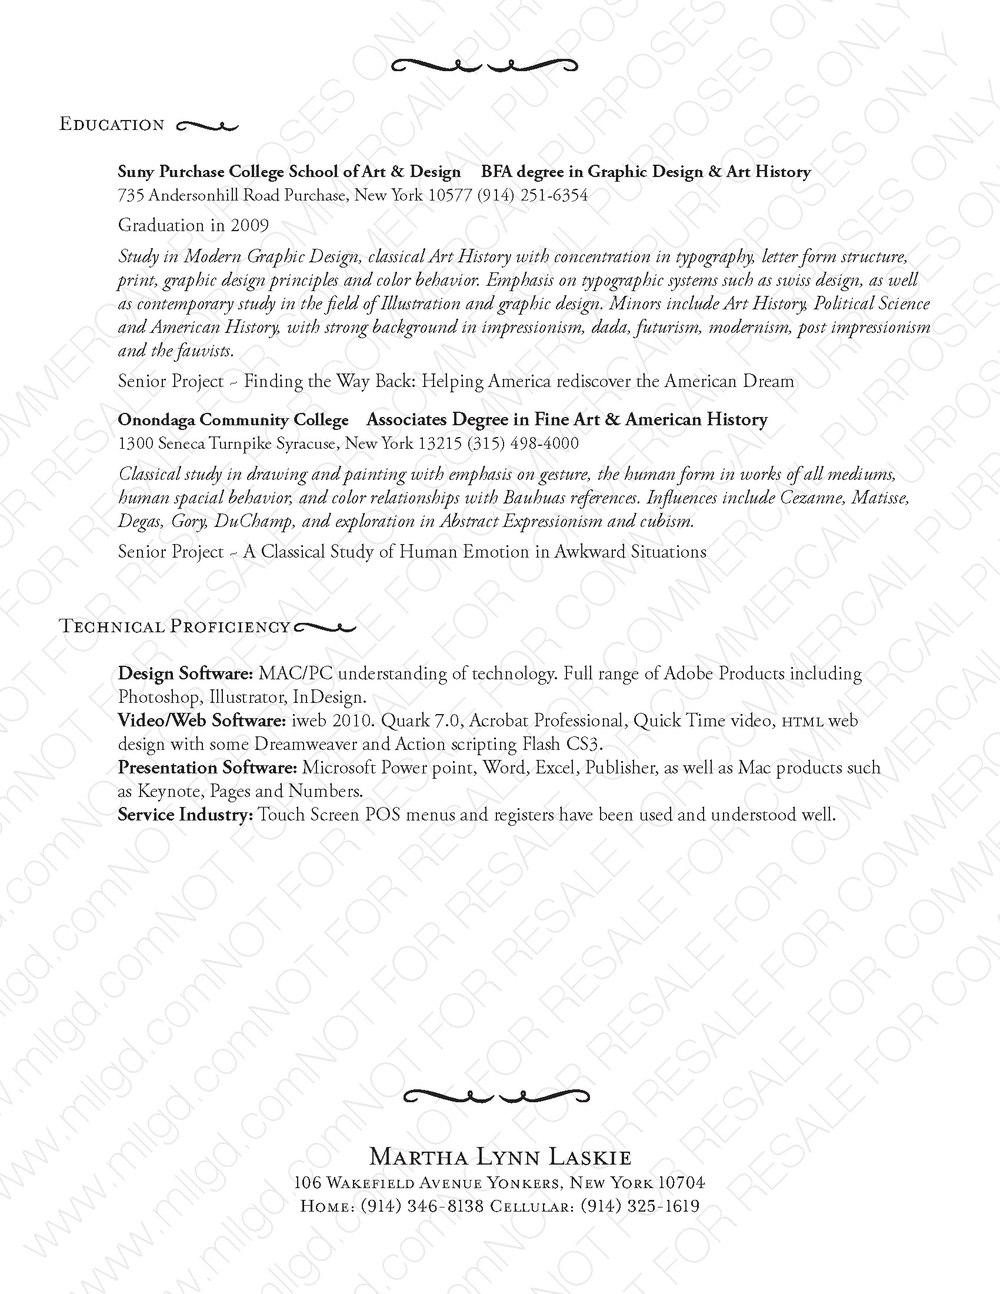 MLL_Resume_Design_2014_Page_57.jpg